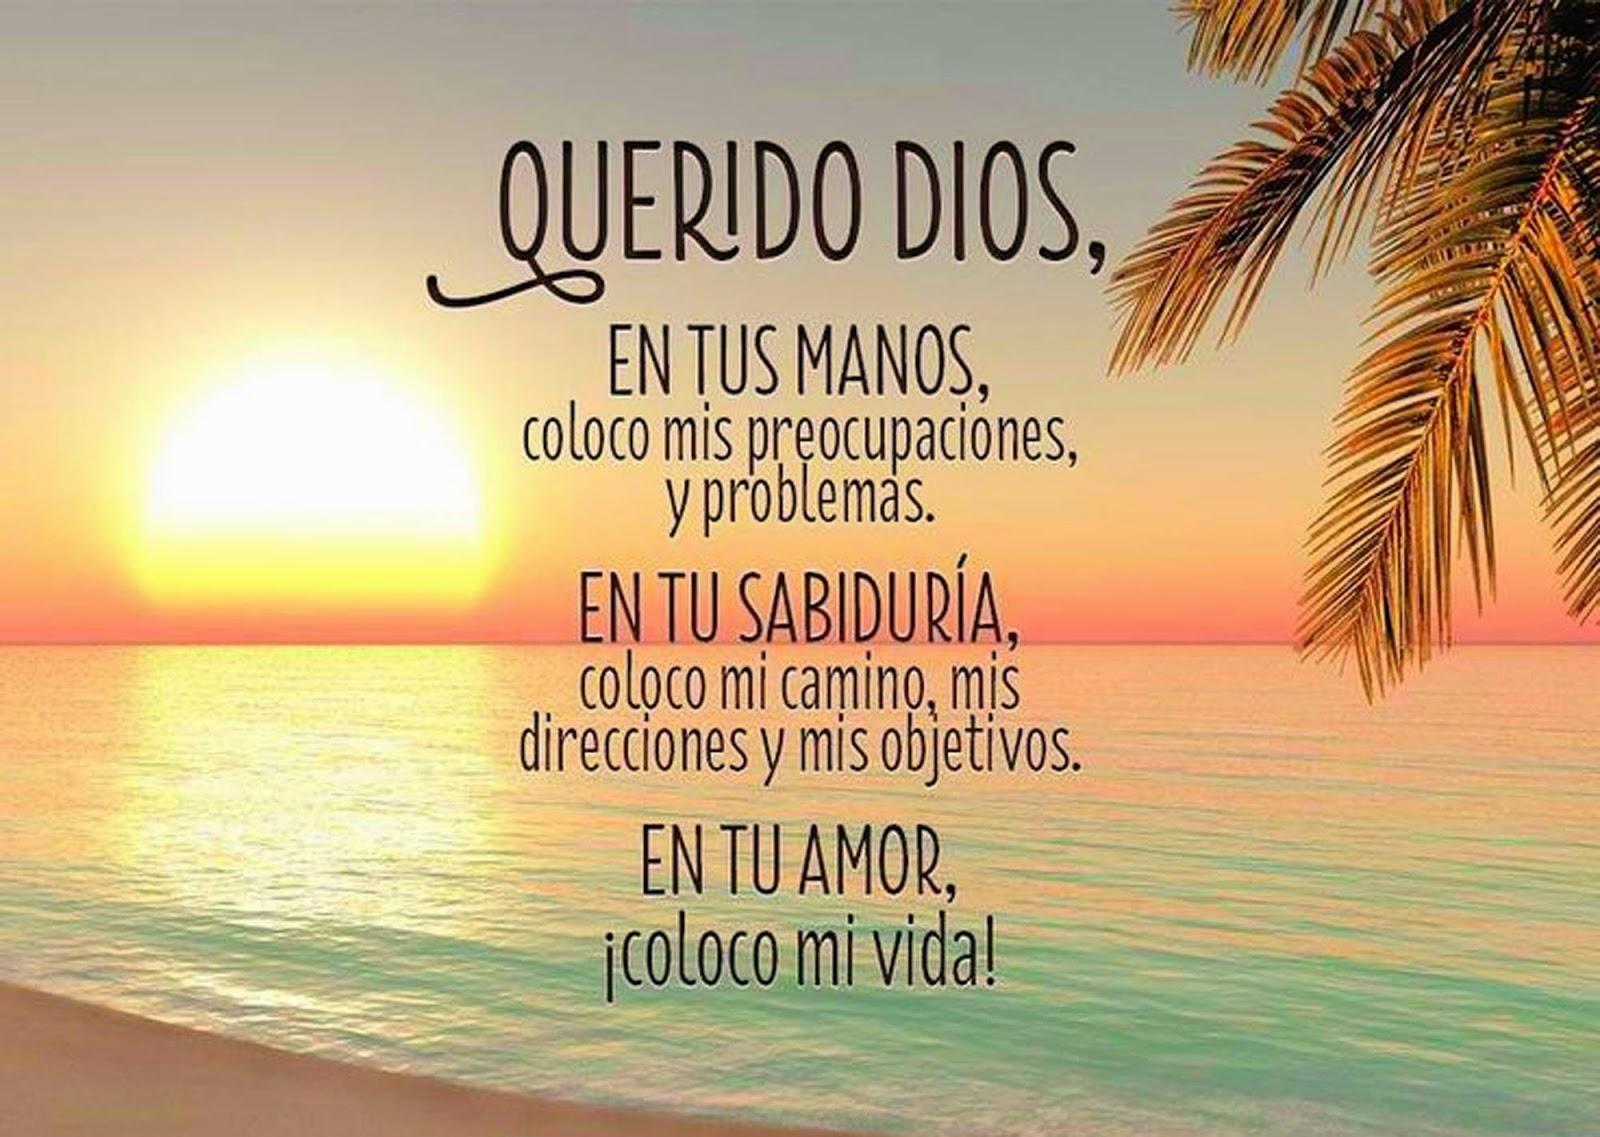 Amor Es Frases: Gracias A Dios Quotes. QuotesGram